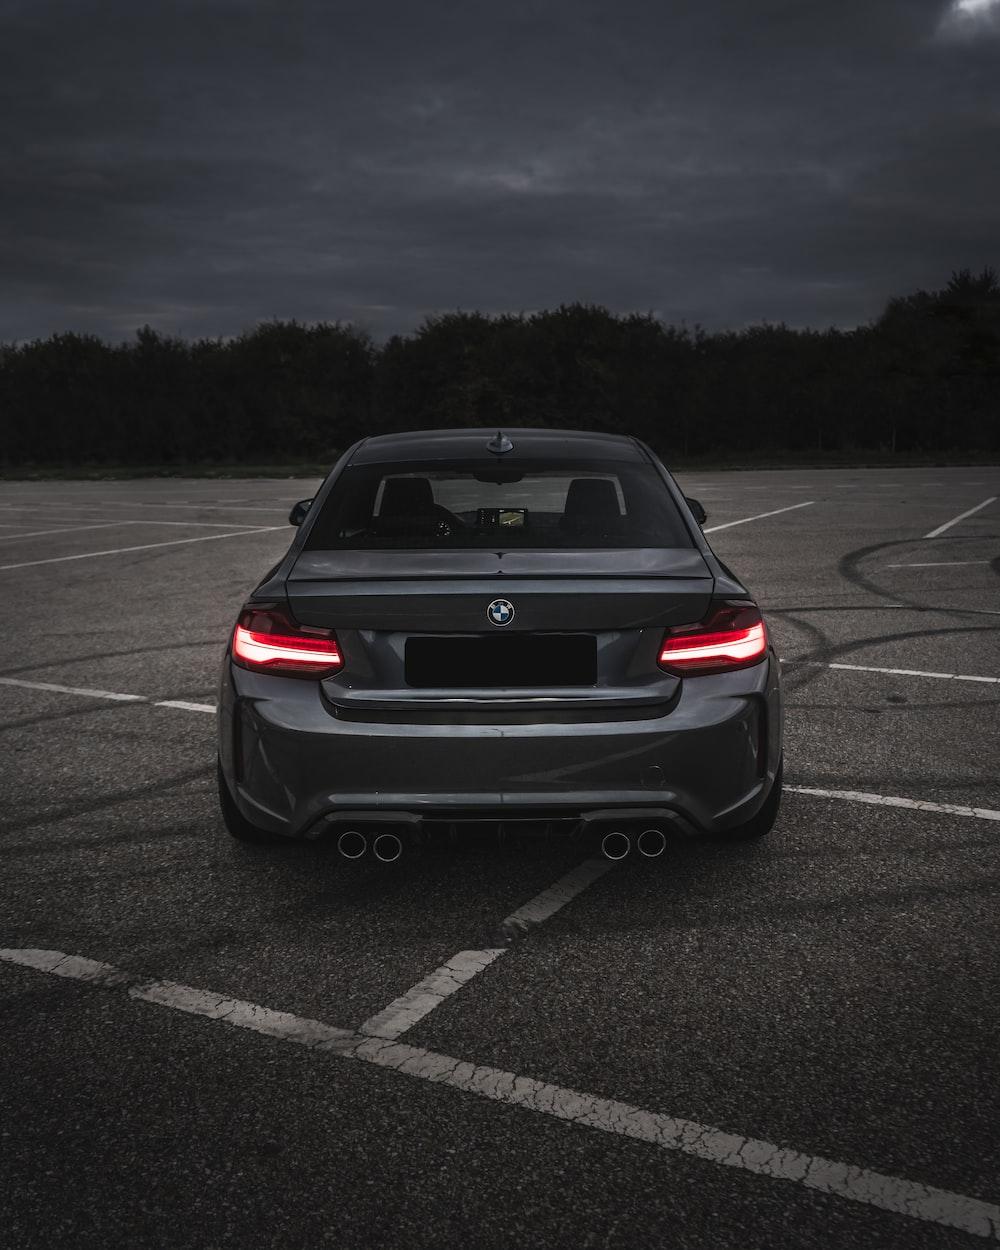 black car on gray asphalt road during daytime